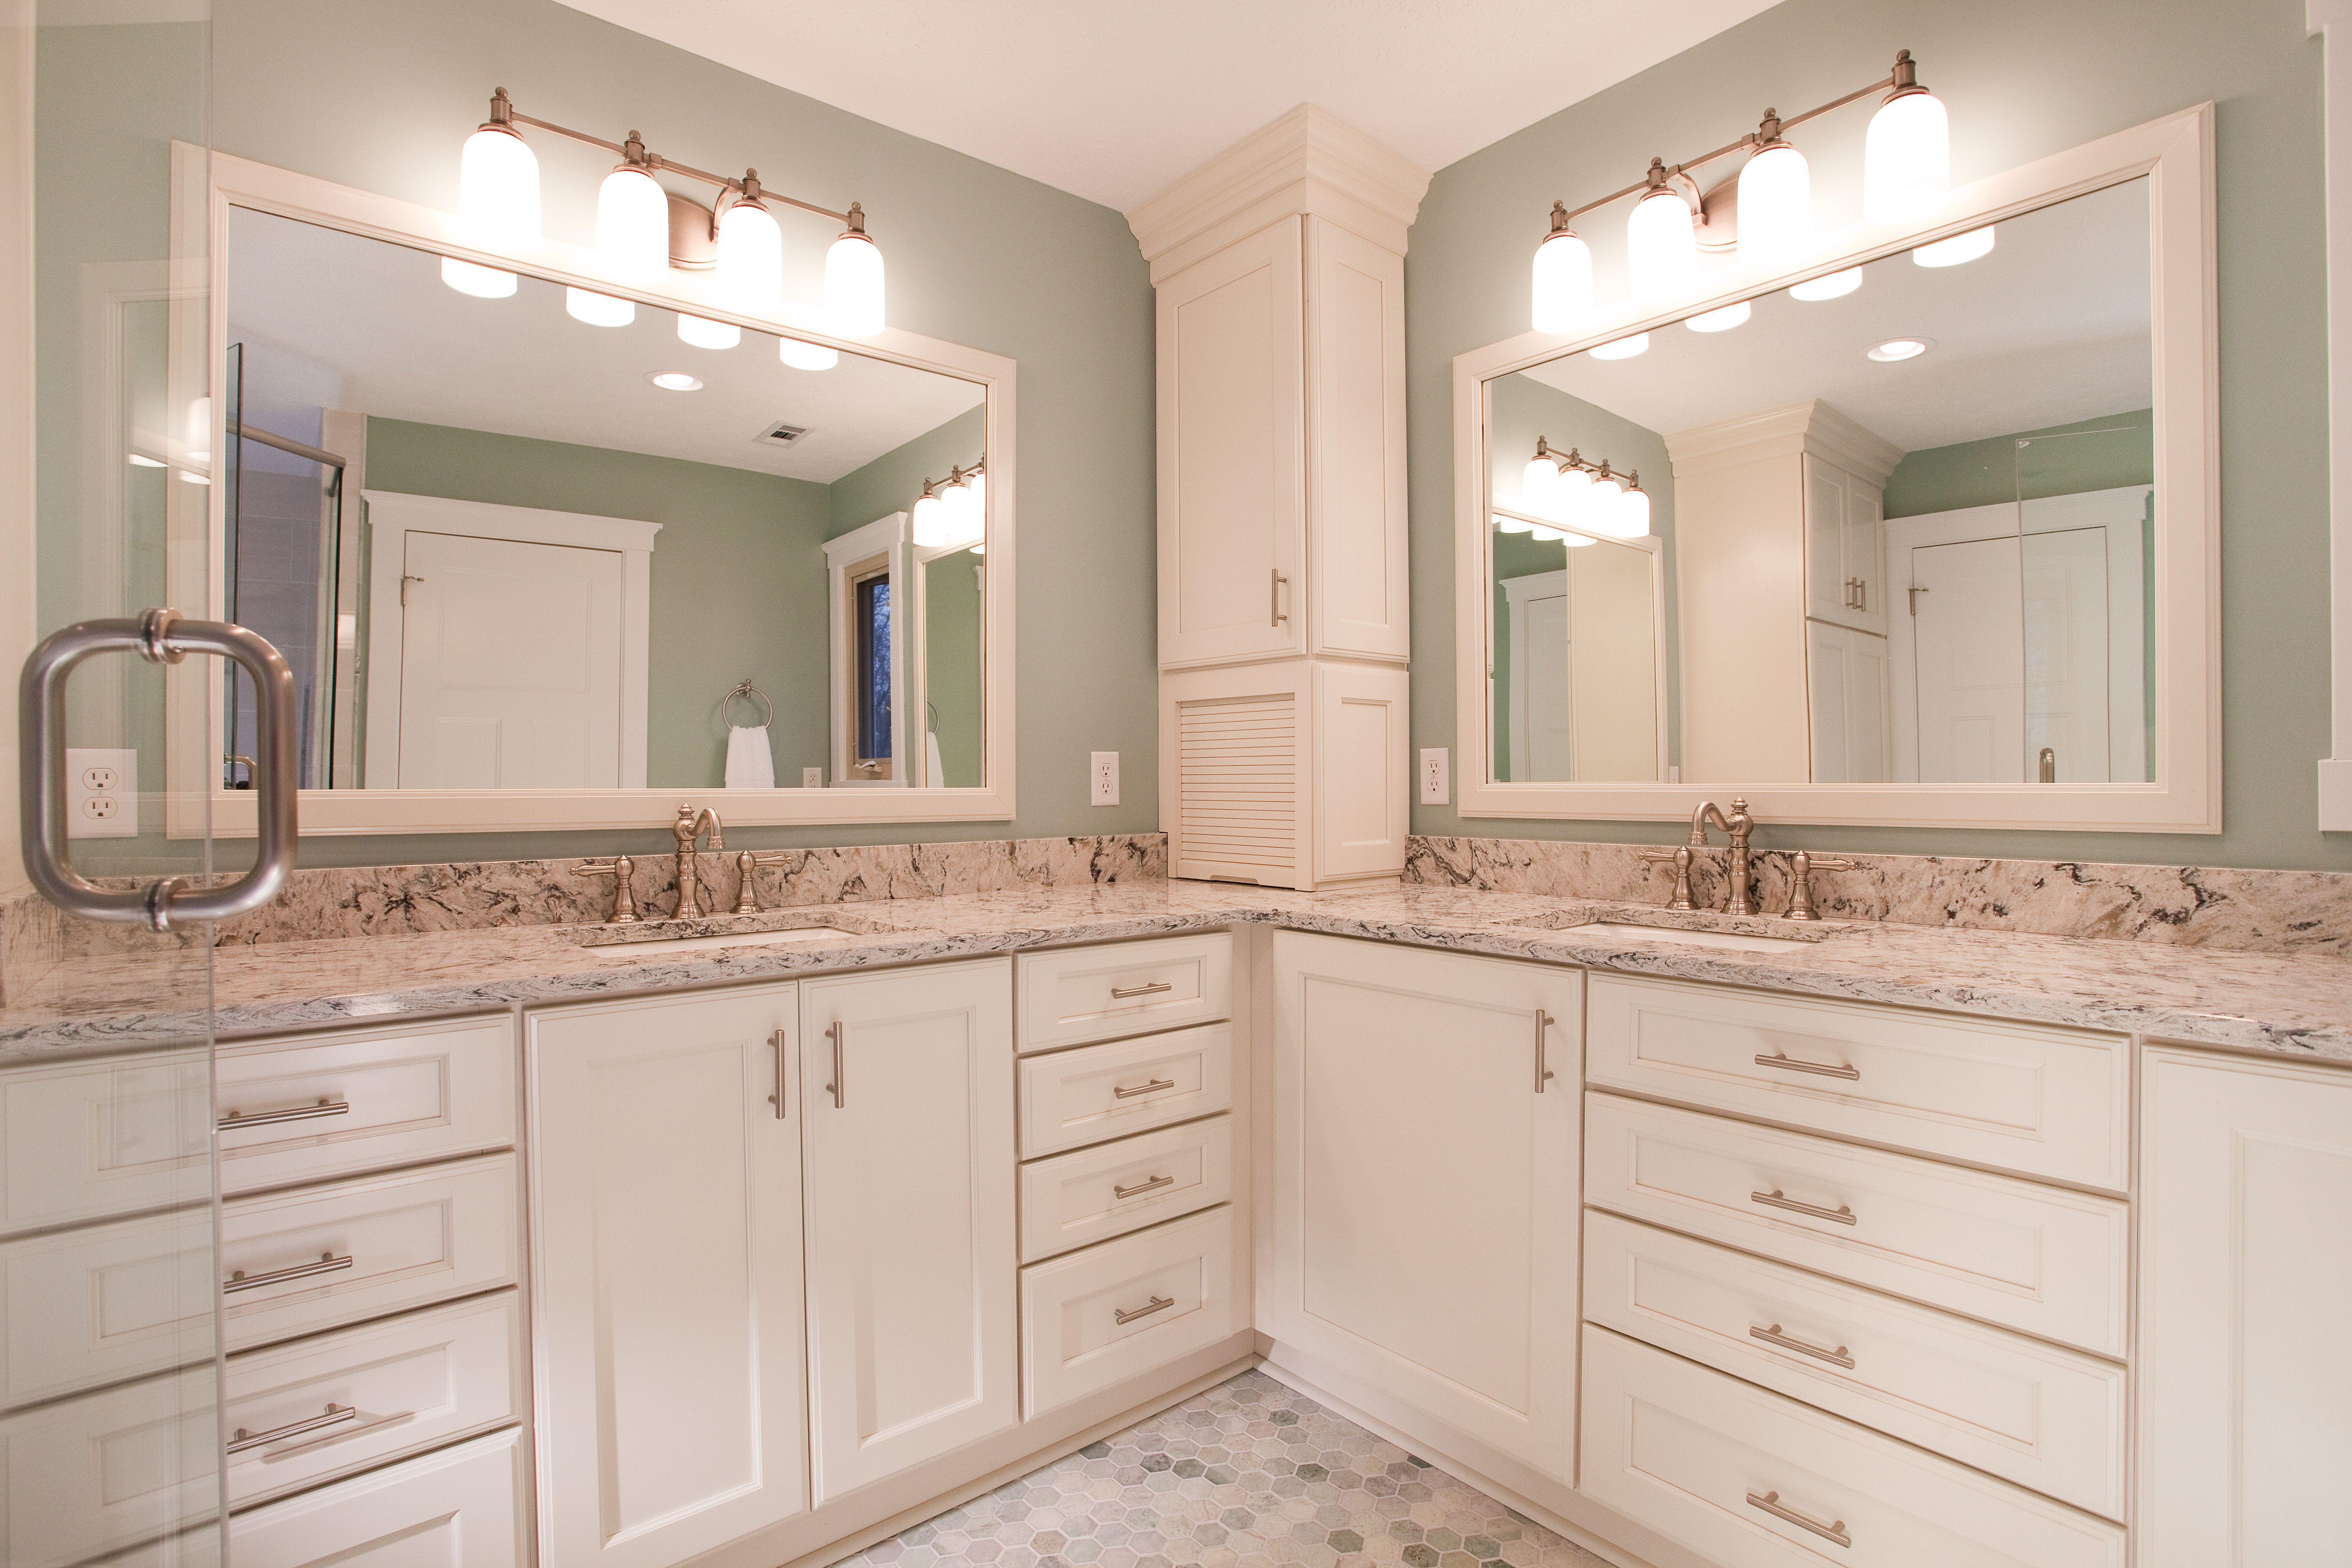 White counter tops beautiful counter tops kitchen quartziteepoxy